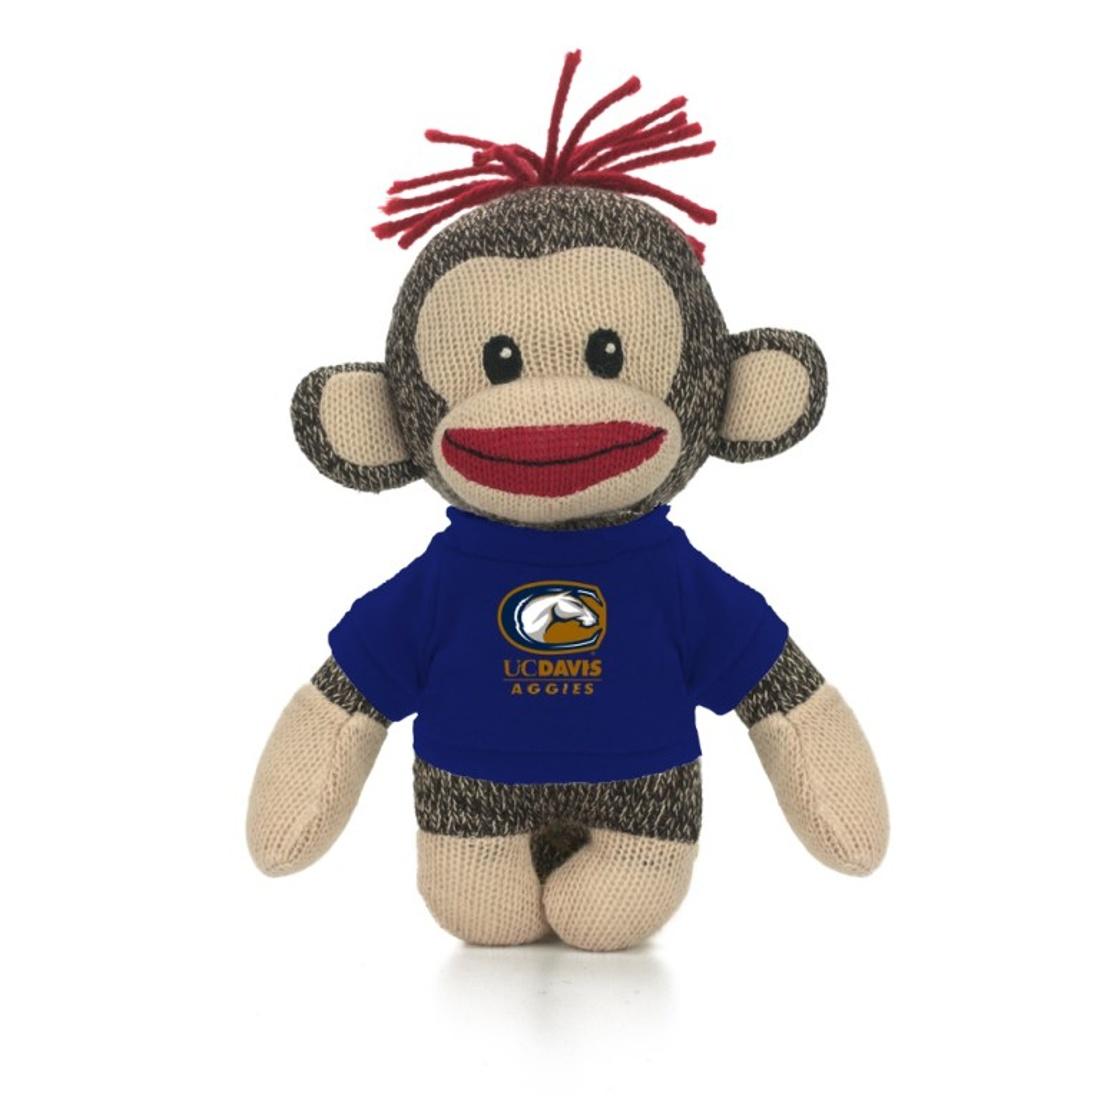 Team Jersey Bears (Collegiate licensed good)